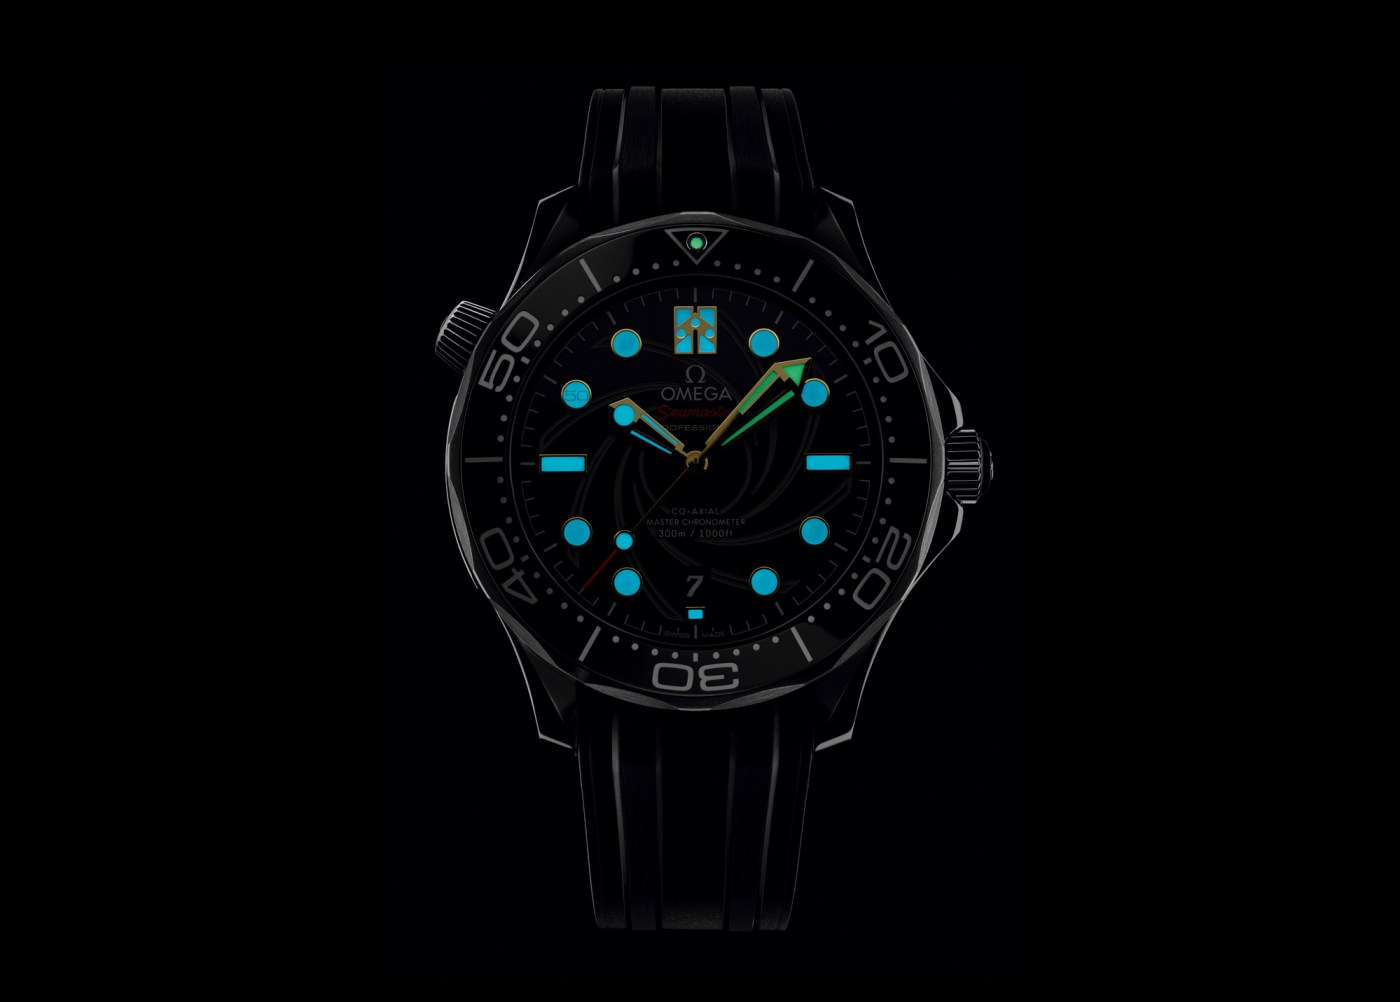 2019 Limited Edition Omega Bond Seamaster